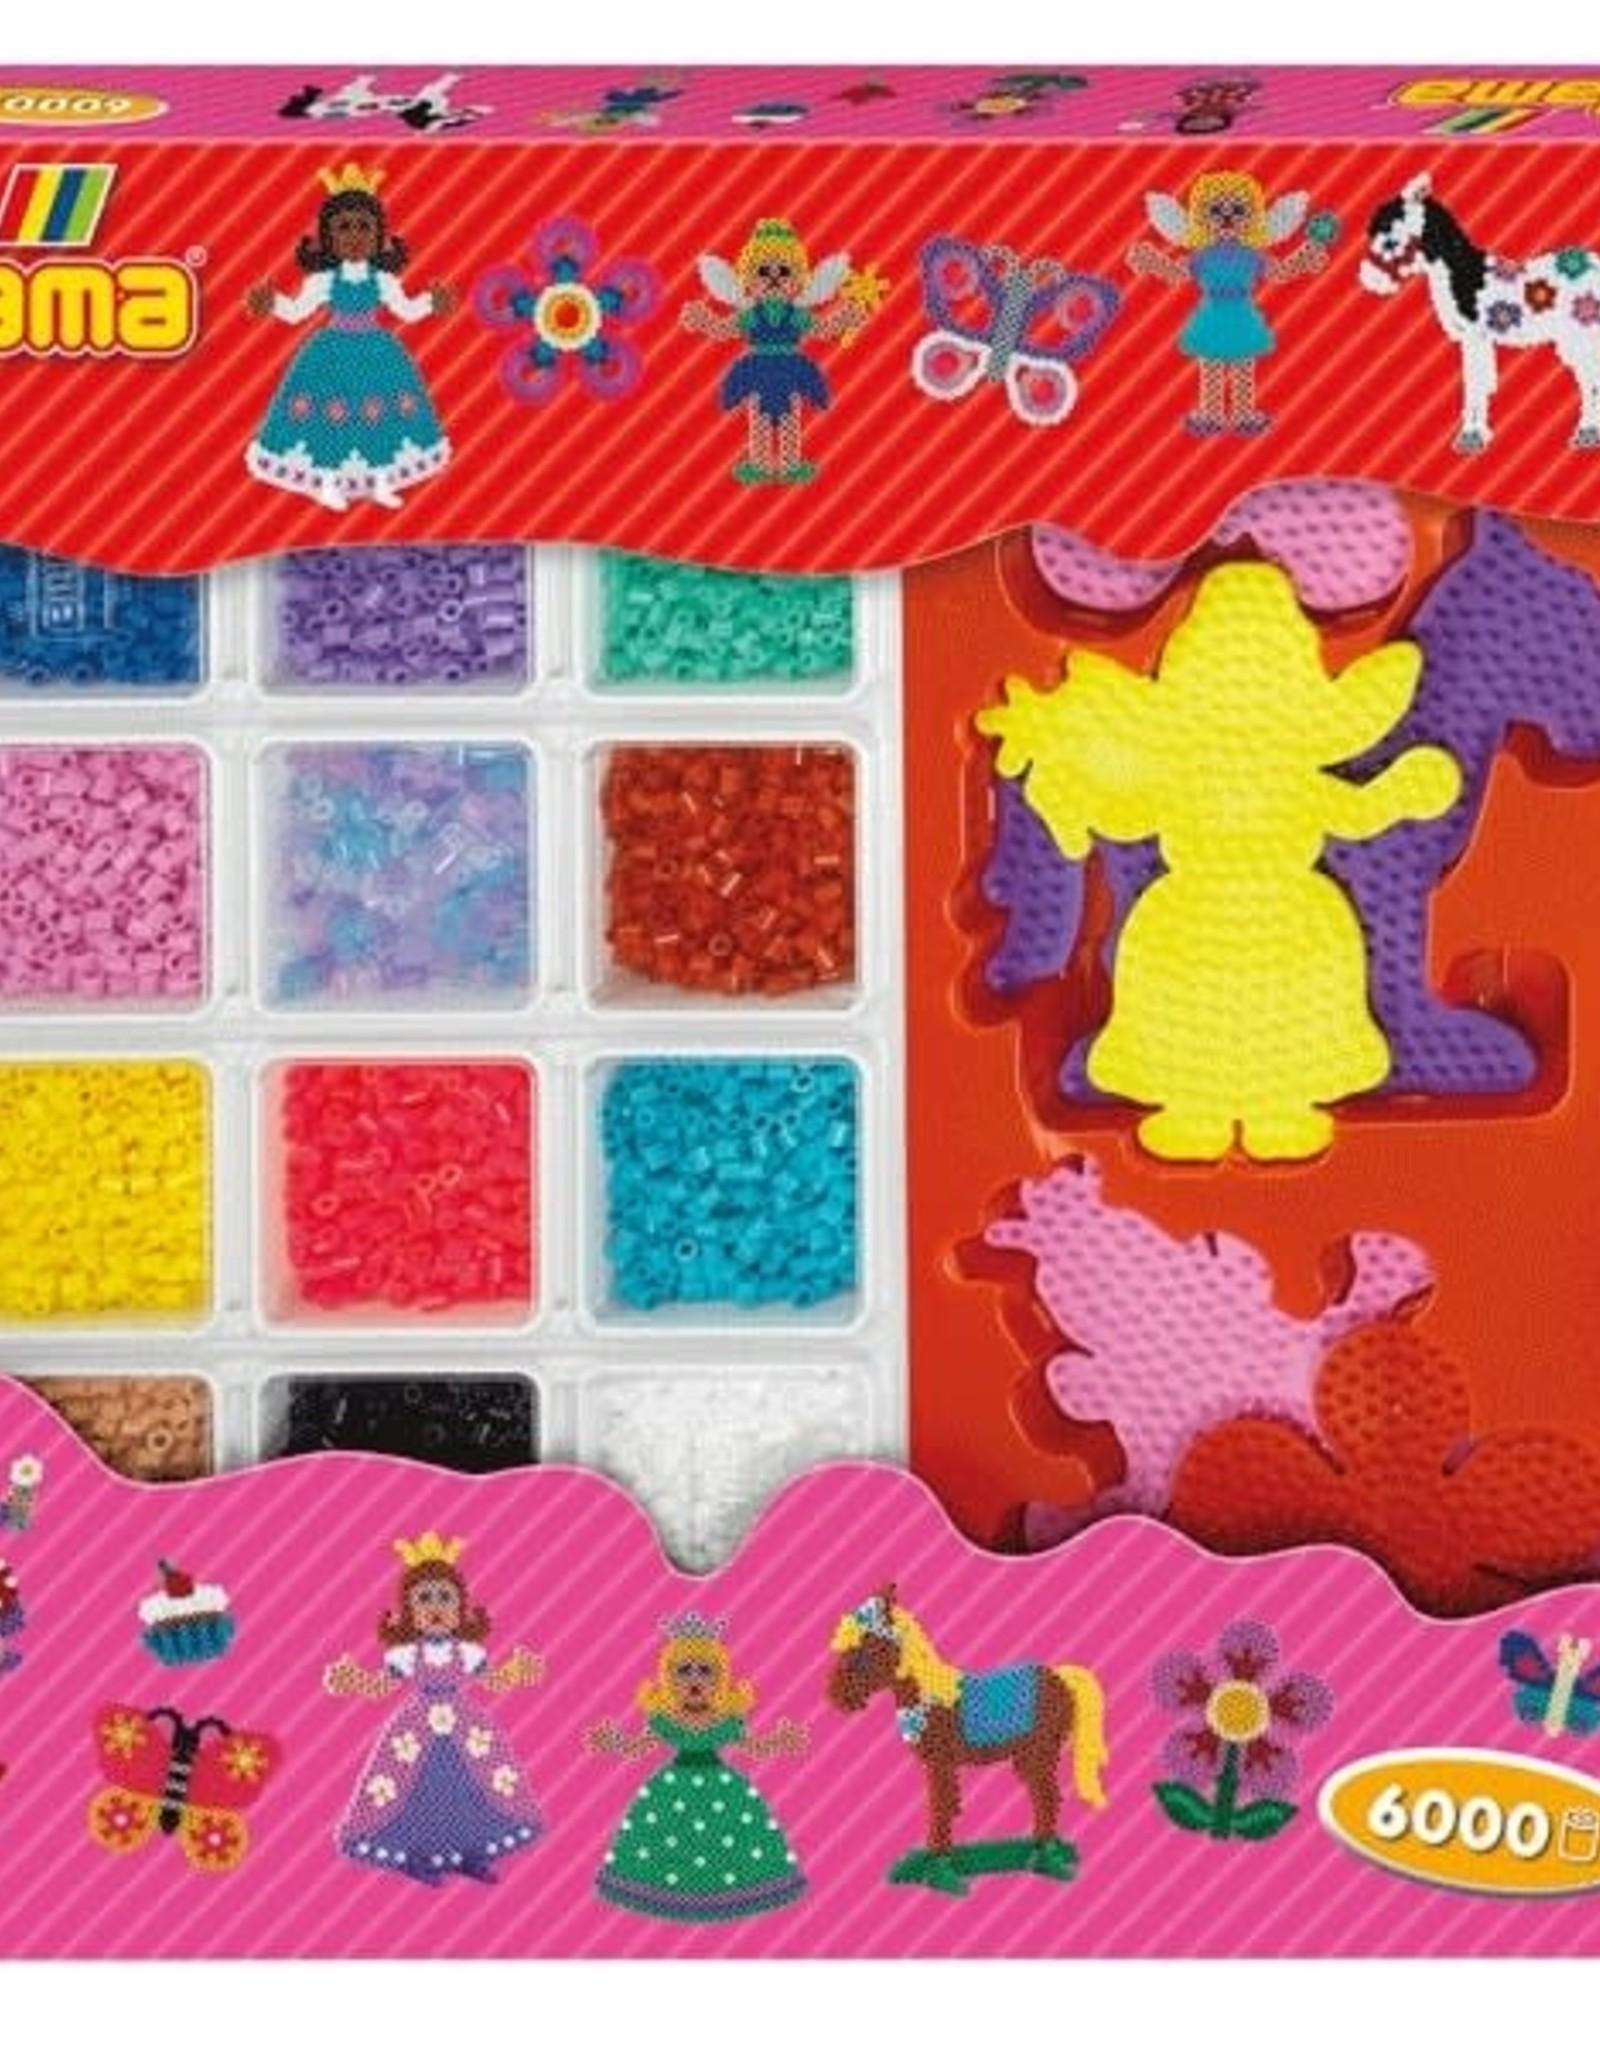 Hama Hama Beads Princess Gift Set - 6000 beads